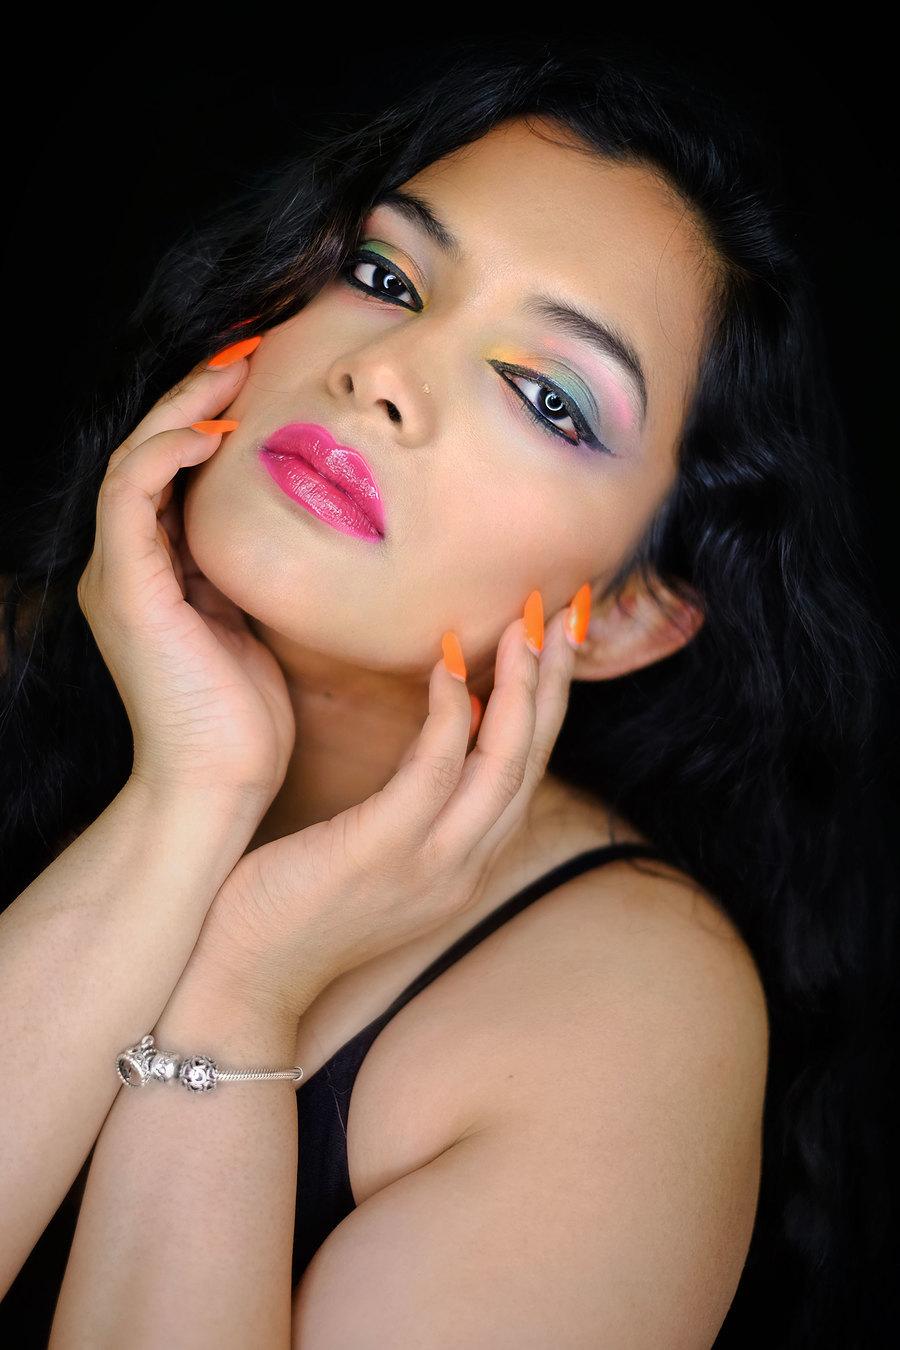 Photography by mymindseye, Model Fatheha / Uploaded 10th June 2020 @ 07:25 PM